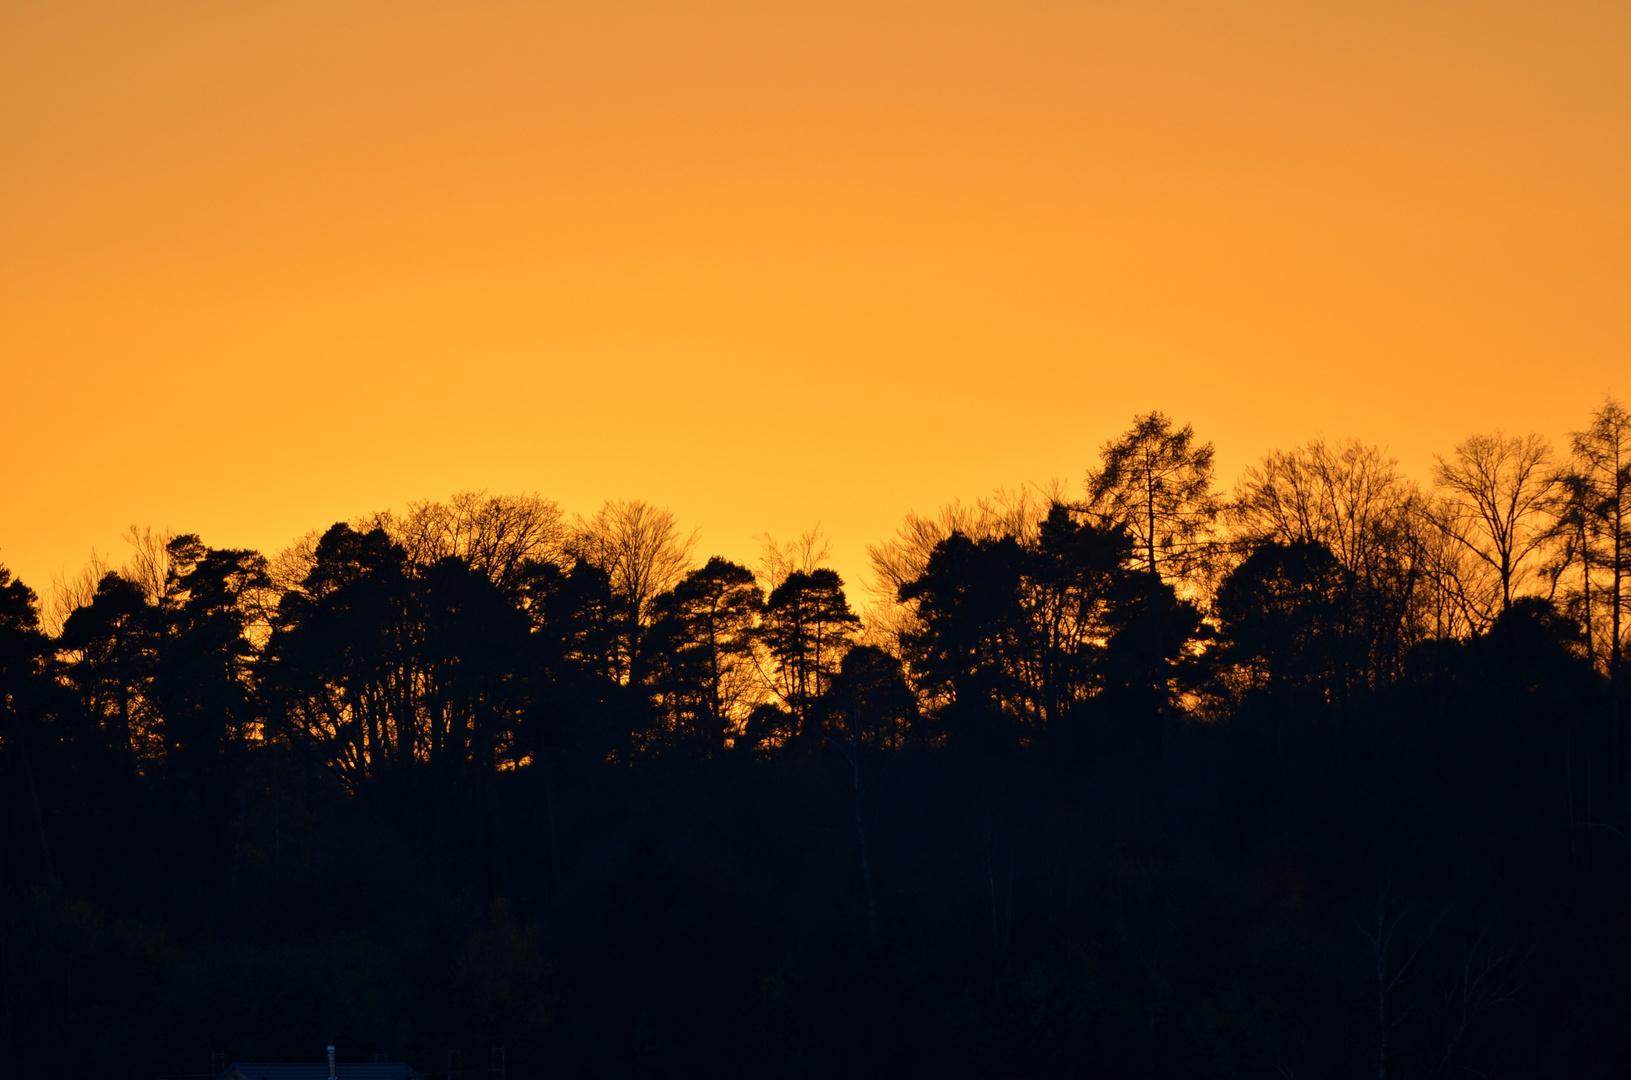 Sonnenuntergang am Wald